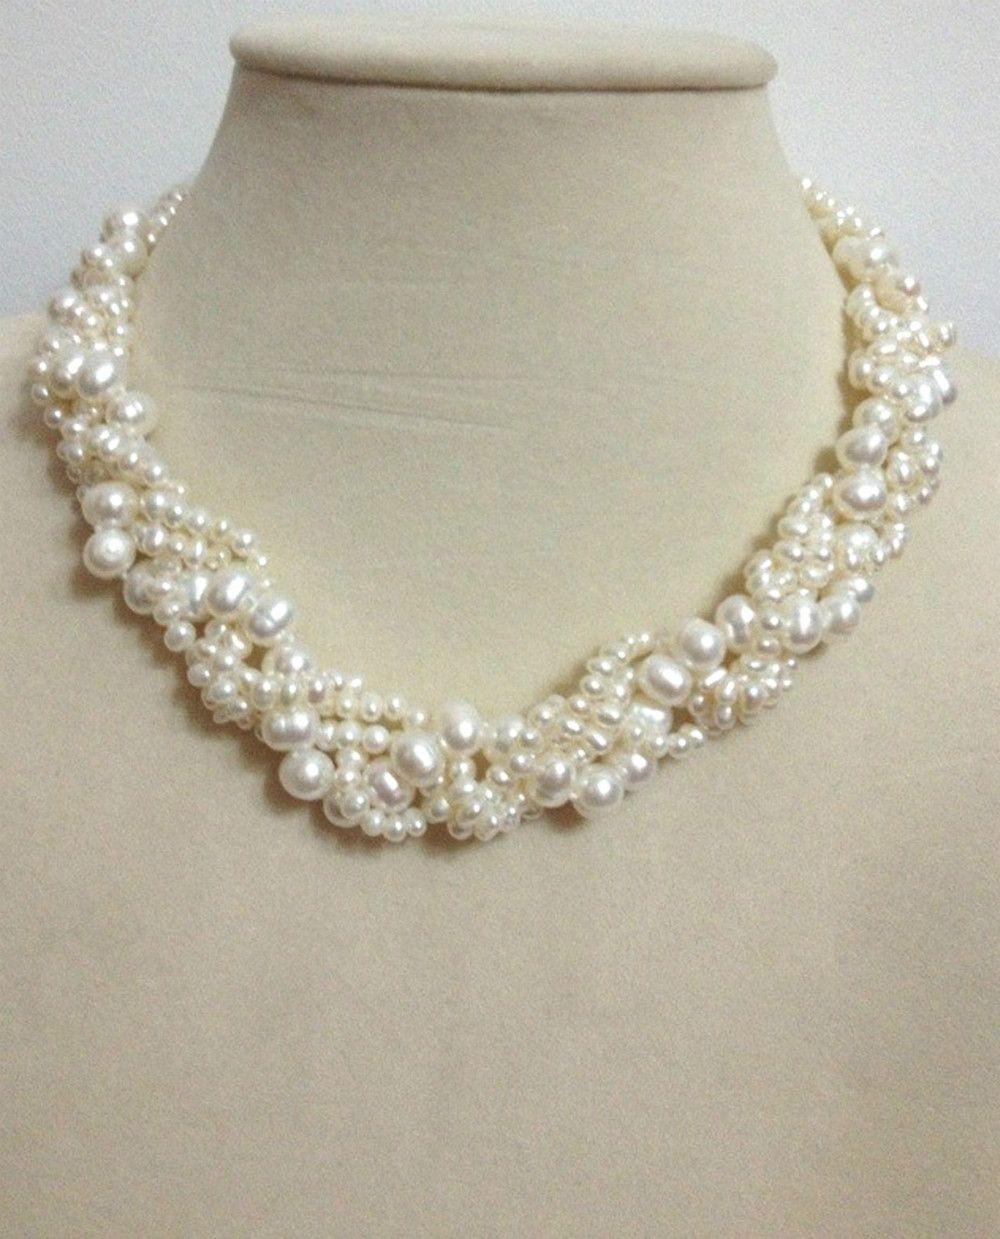 Pearl Necklace Wedding CLEARANCE Pearl Pendant Tiered Necklace SALE Pearl Neclace Pearl Necklace Pearl Jewlery Pearl Jewelry